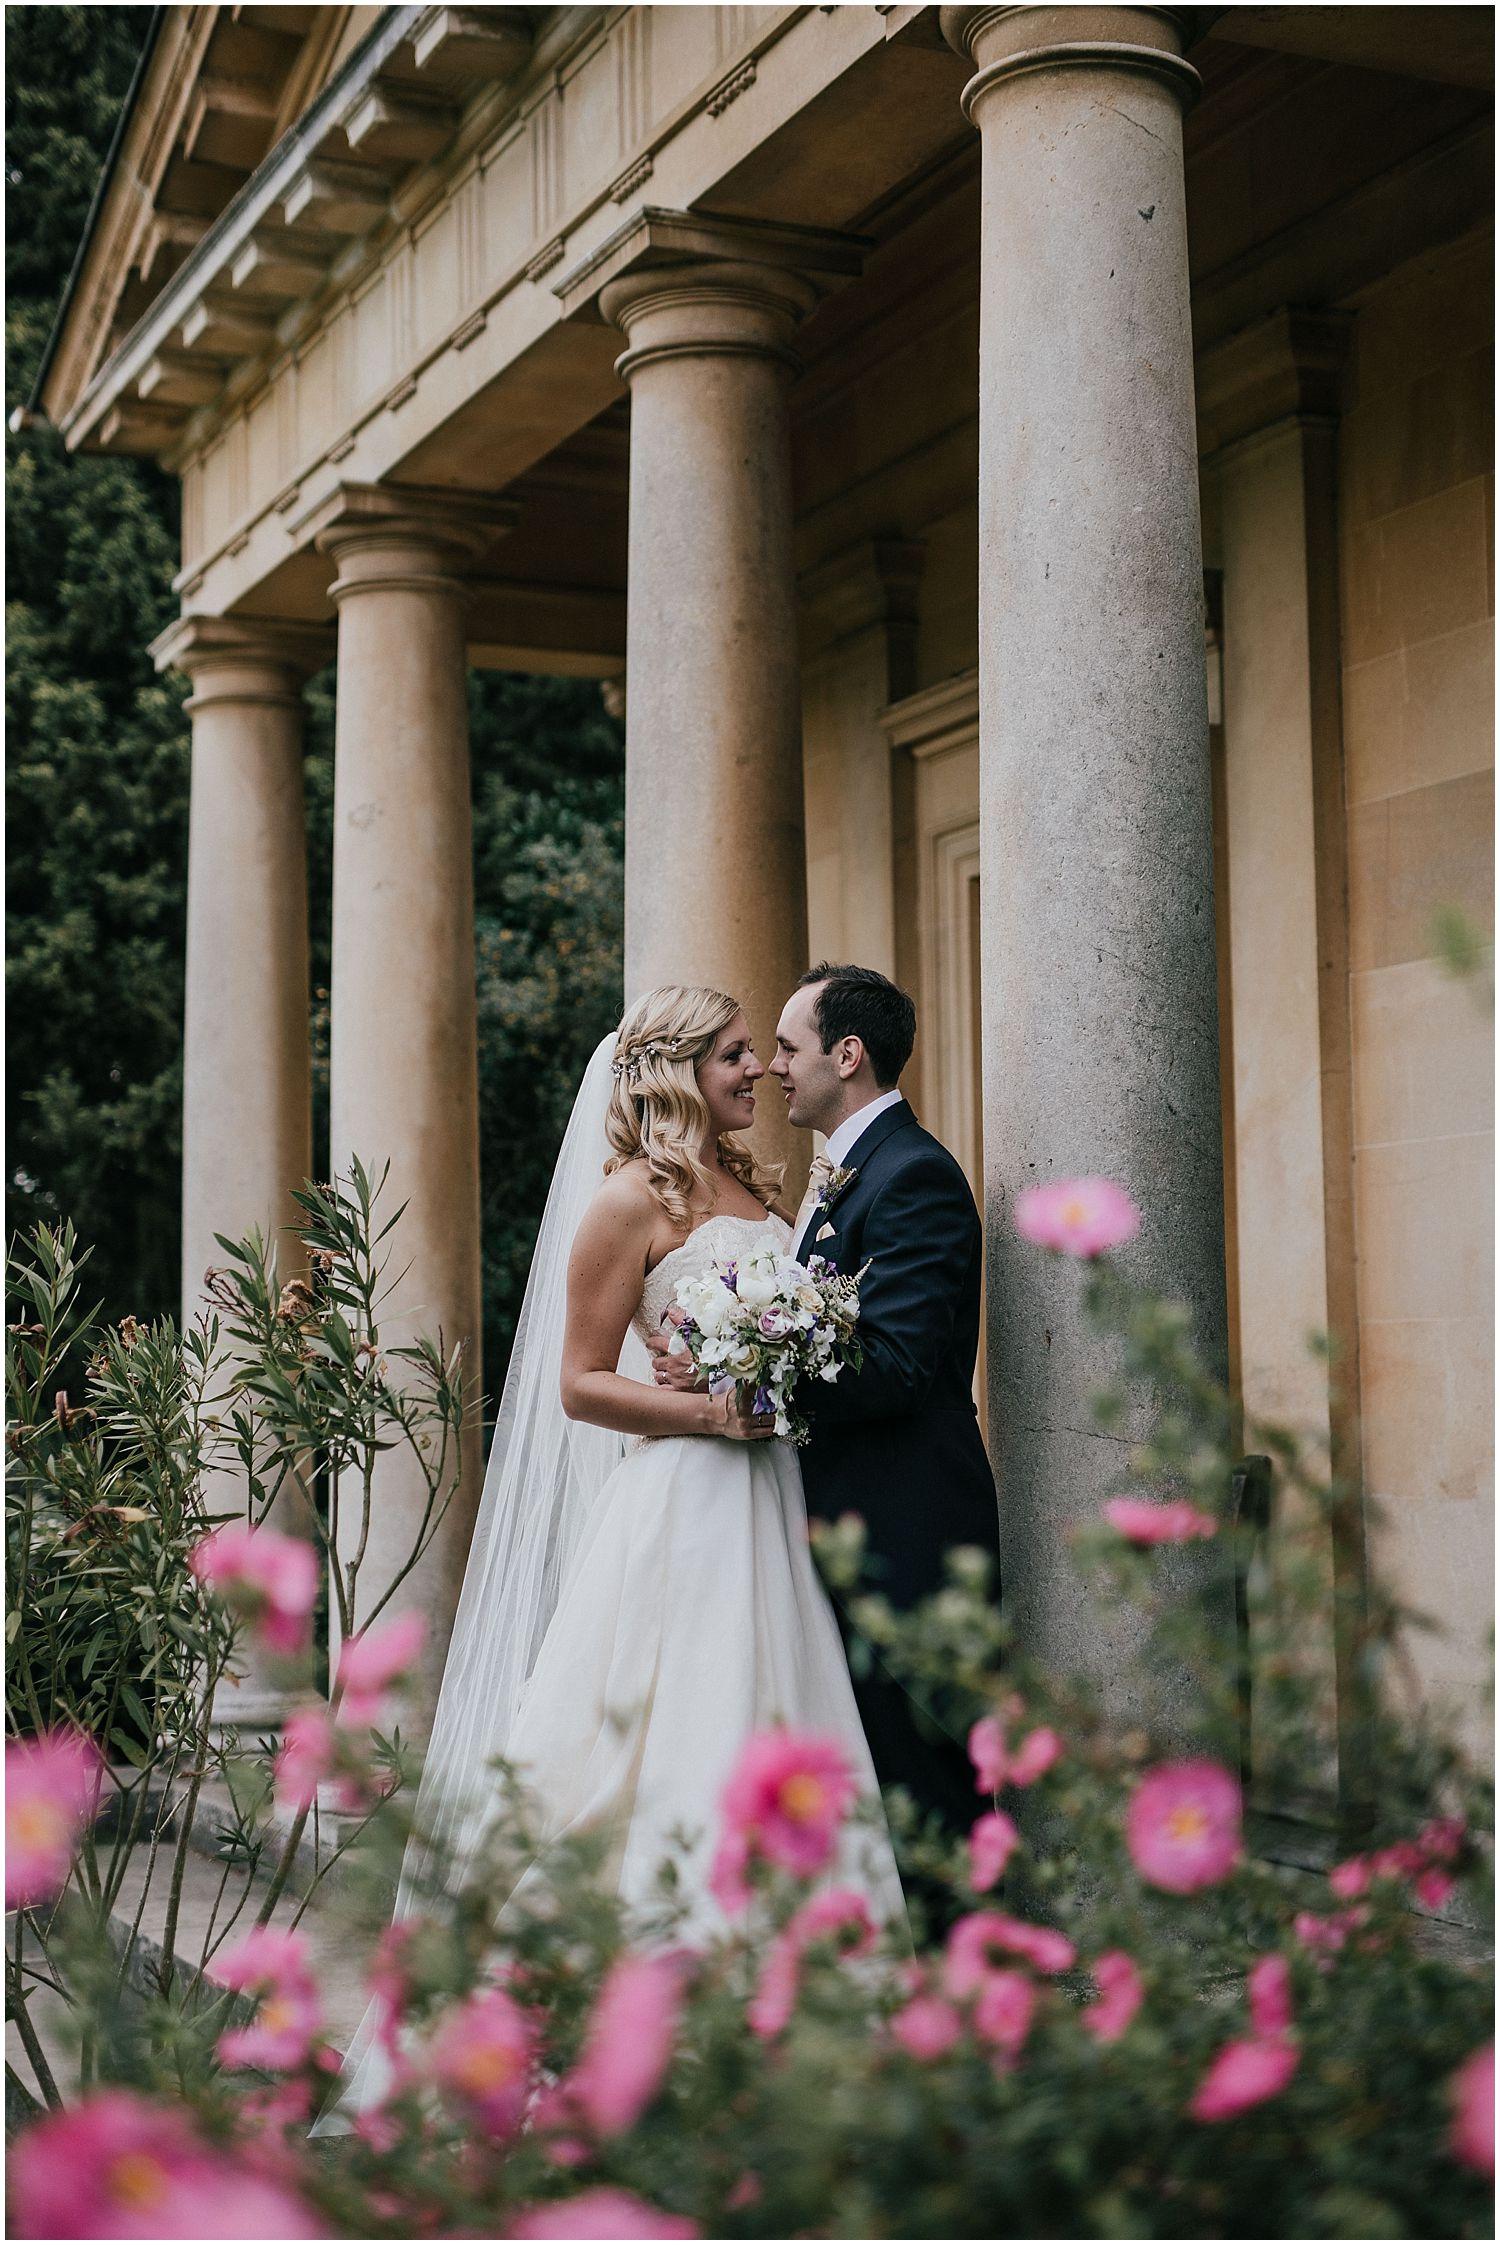 Cambridge Cottage Kew Gardens wedding_0051.jpg